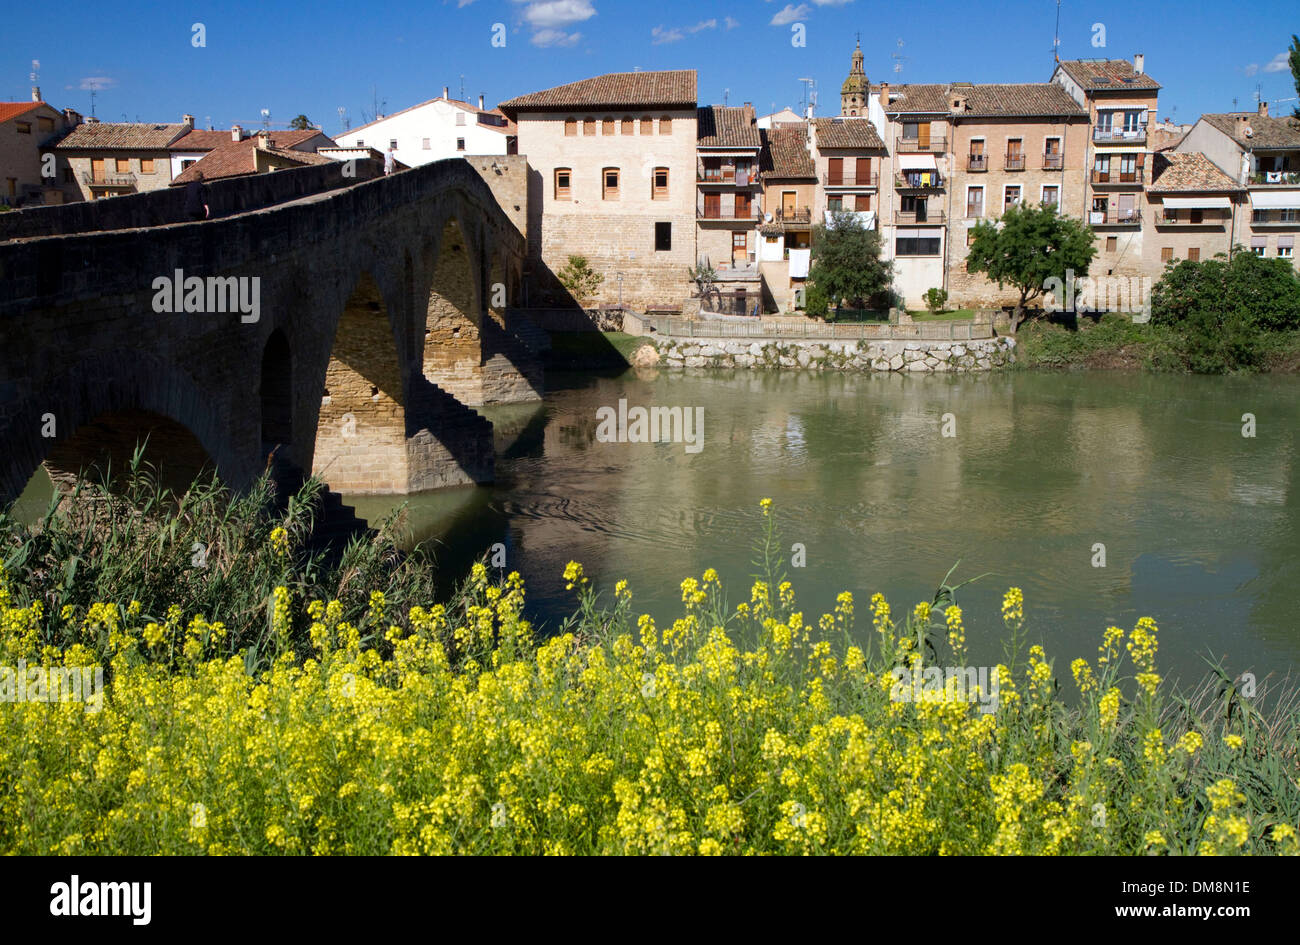 Six-arched Roman bridge spanning the Arga River on the Way of St. James pilgrimage route in Puente La Reina, Navarra, Spain. - Stock Image